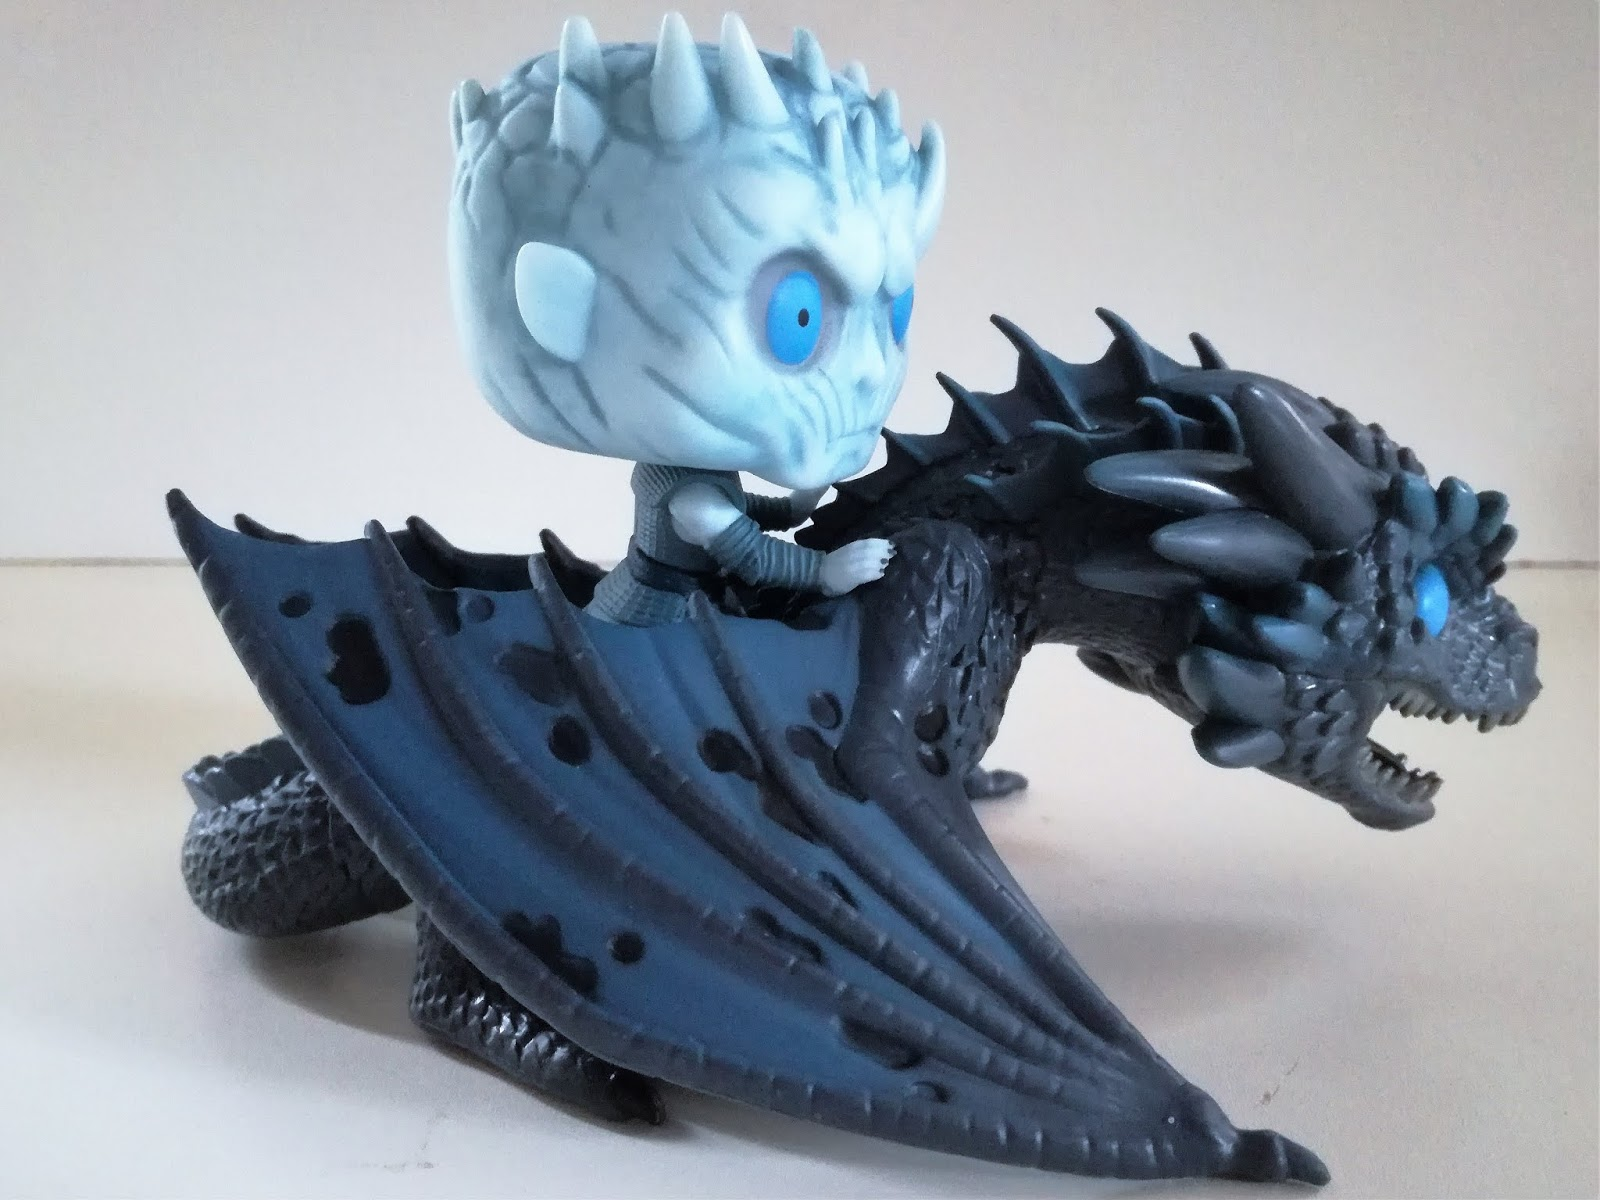 Game Of Thrones Night King Icy Viserion Funko Pop 58 Bott Bvs Aquaman Blue Ie Https Funkocom Searchqnight20kingfocuspop Rides Got